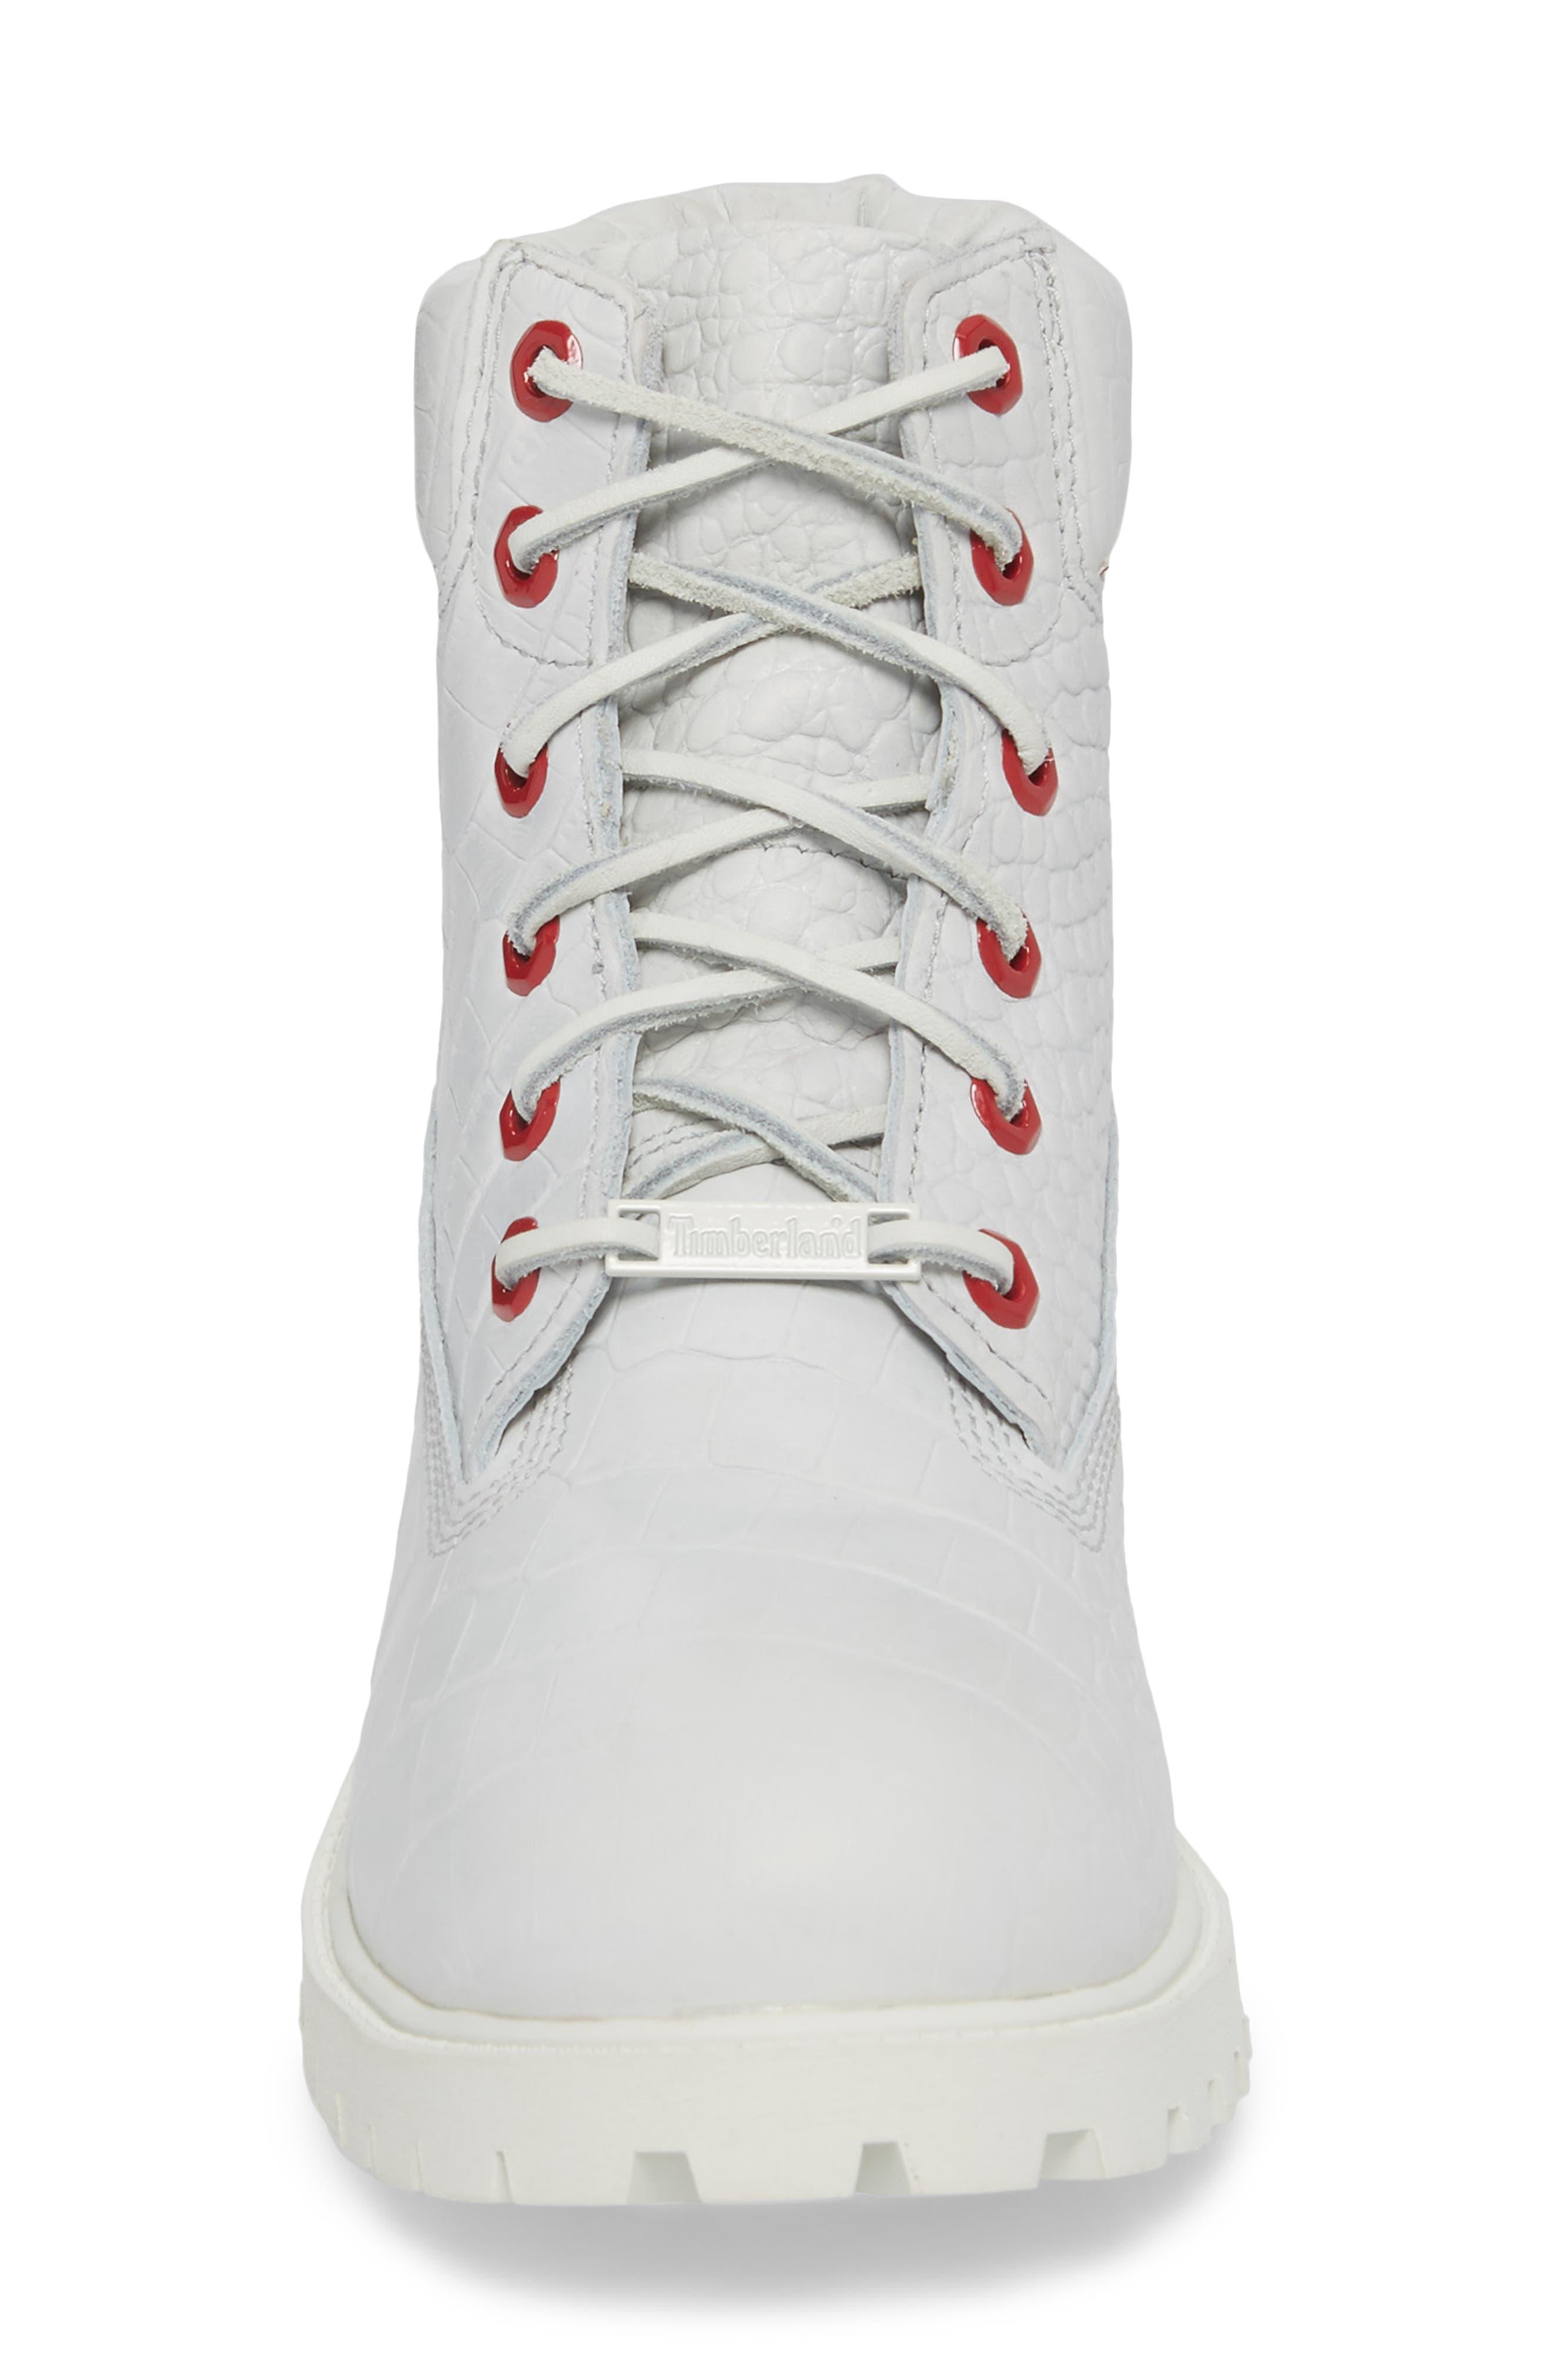 6-Inch Premium Waterproof Boot,                             Alternate thumbnail 4, color,                             White Cardinal Exotic